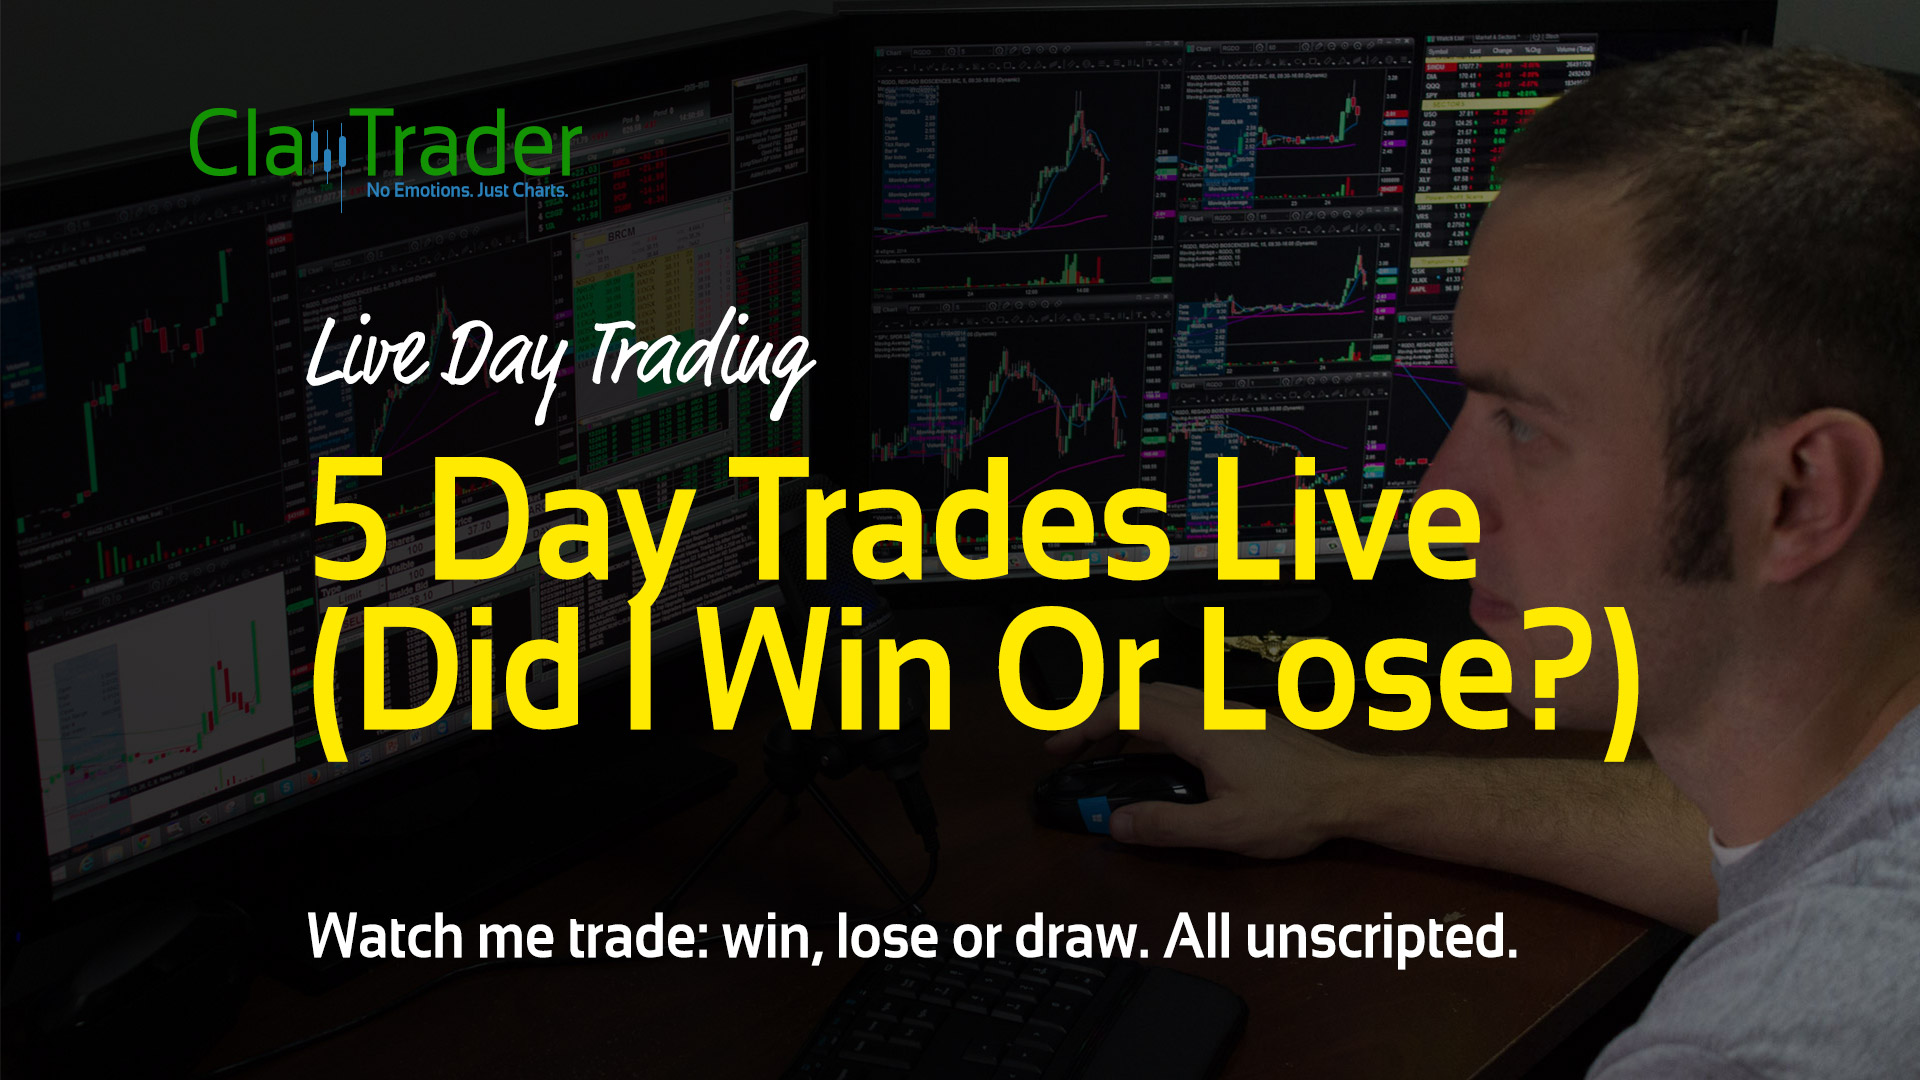 5 Day Trades Live (Did I Win Or Lose?)